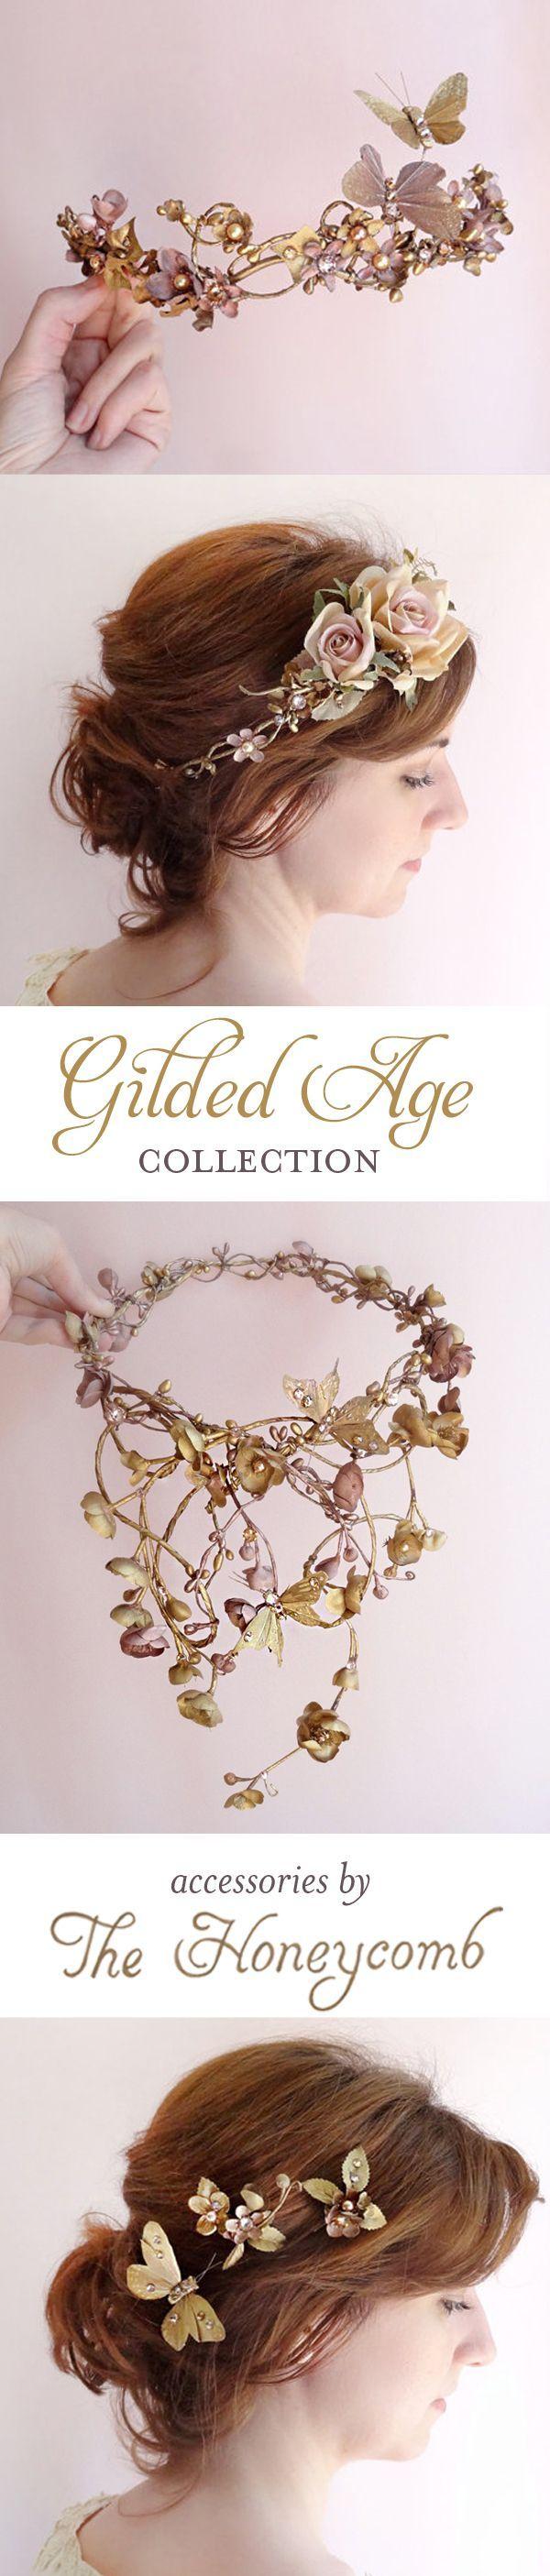 Wedding Crowns : Picture Description Bronze metallic hair accessories with gilded butterflies and Swarovski…